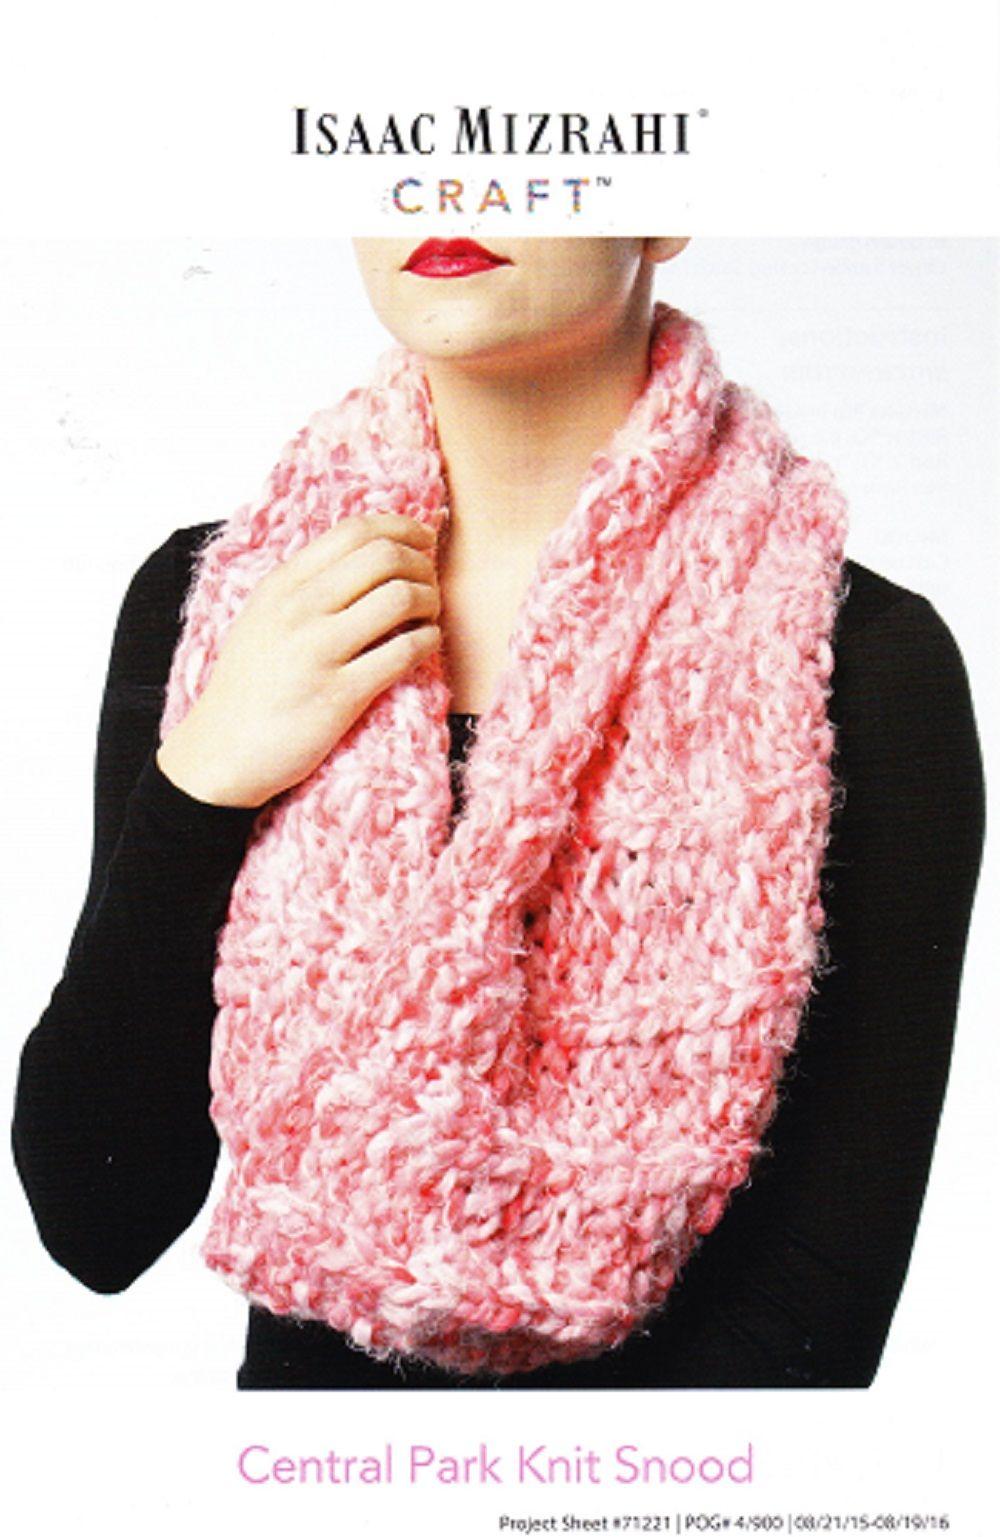 Isaac Mizrahi Knitting Pattern, Central Park Knit Snood | Knitting ...